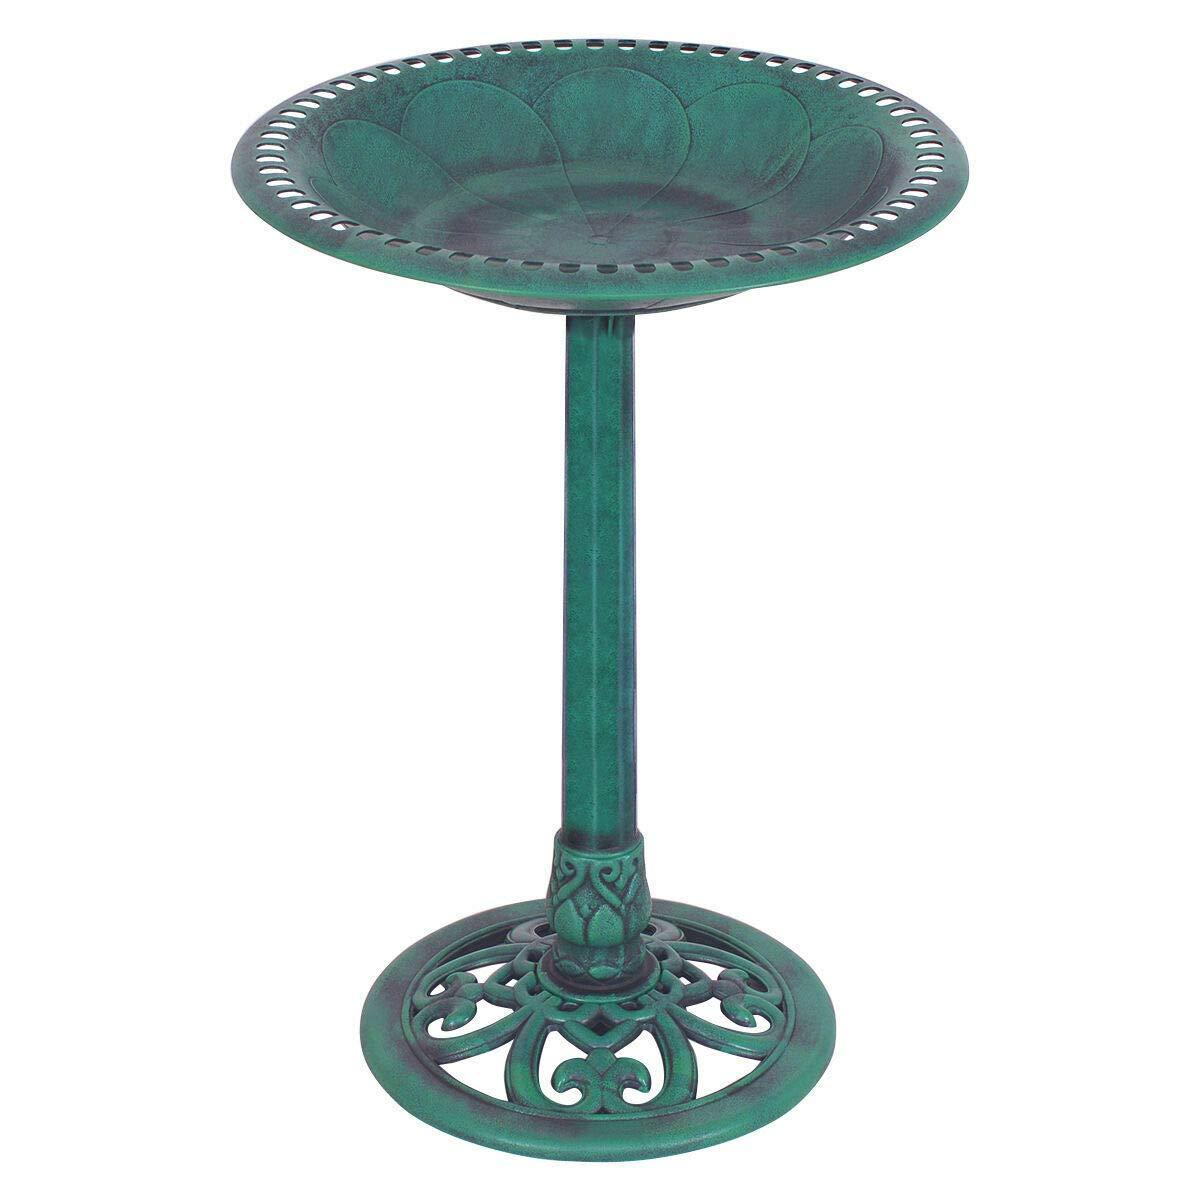 Cozinest Green Pedestal Bird Bath Feeder Freestanding Outdoor Garden Yard Patio Decor